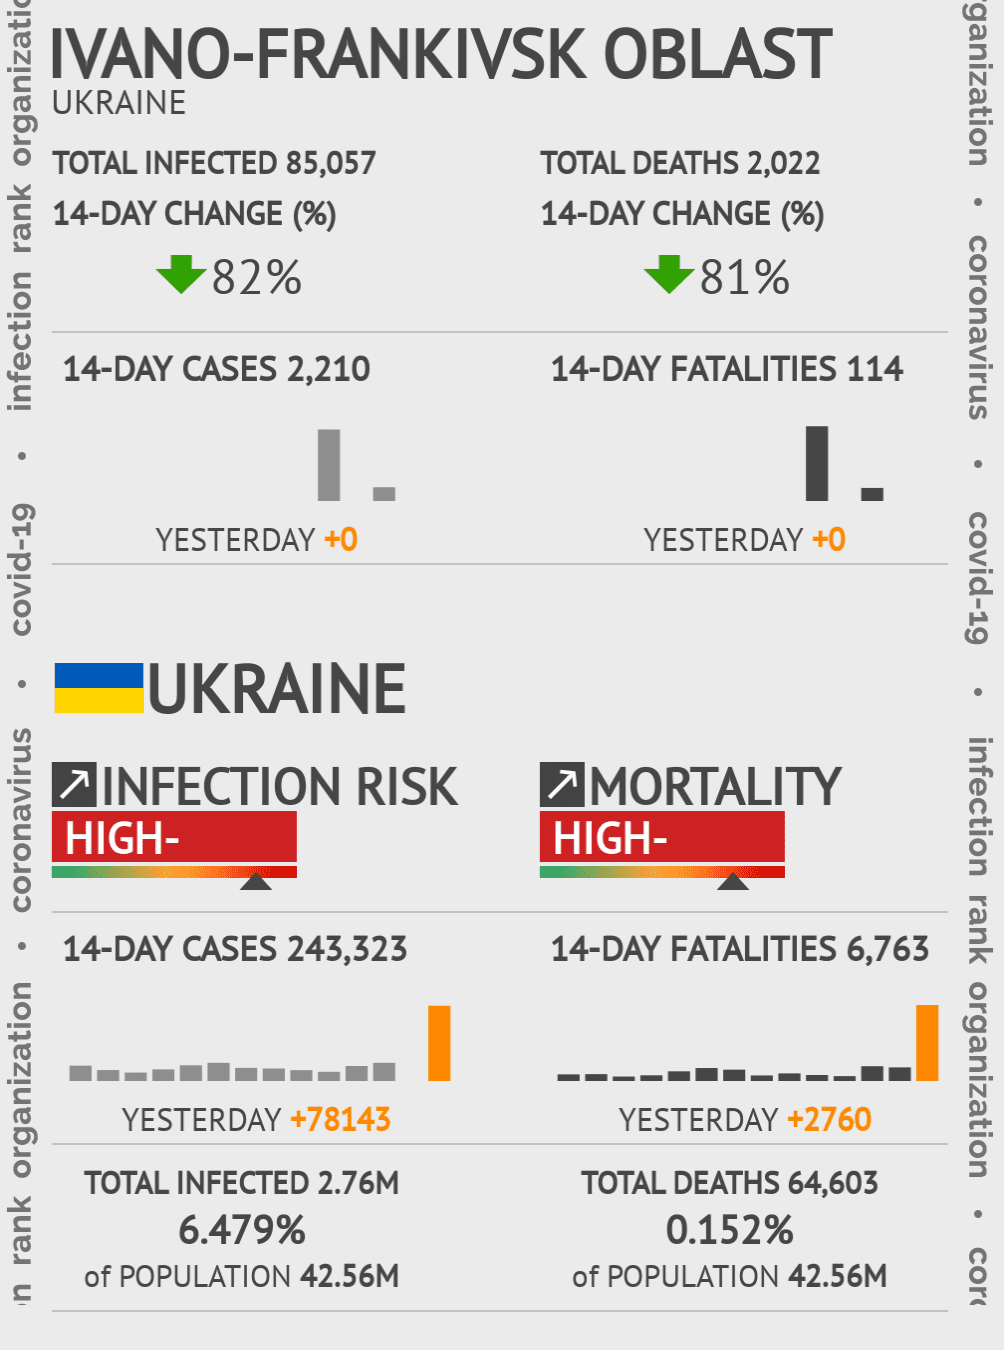 Ivano-Frankivsk Oblast Coronavirus Covid-19 Risk of Infection on March 03, 2021